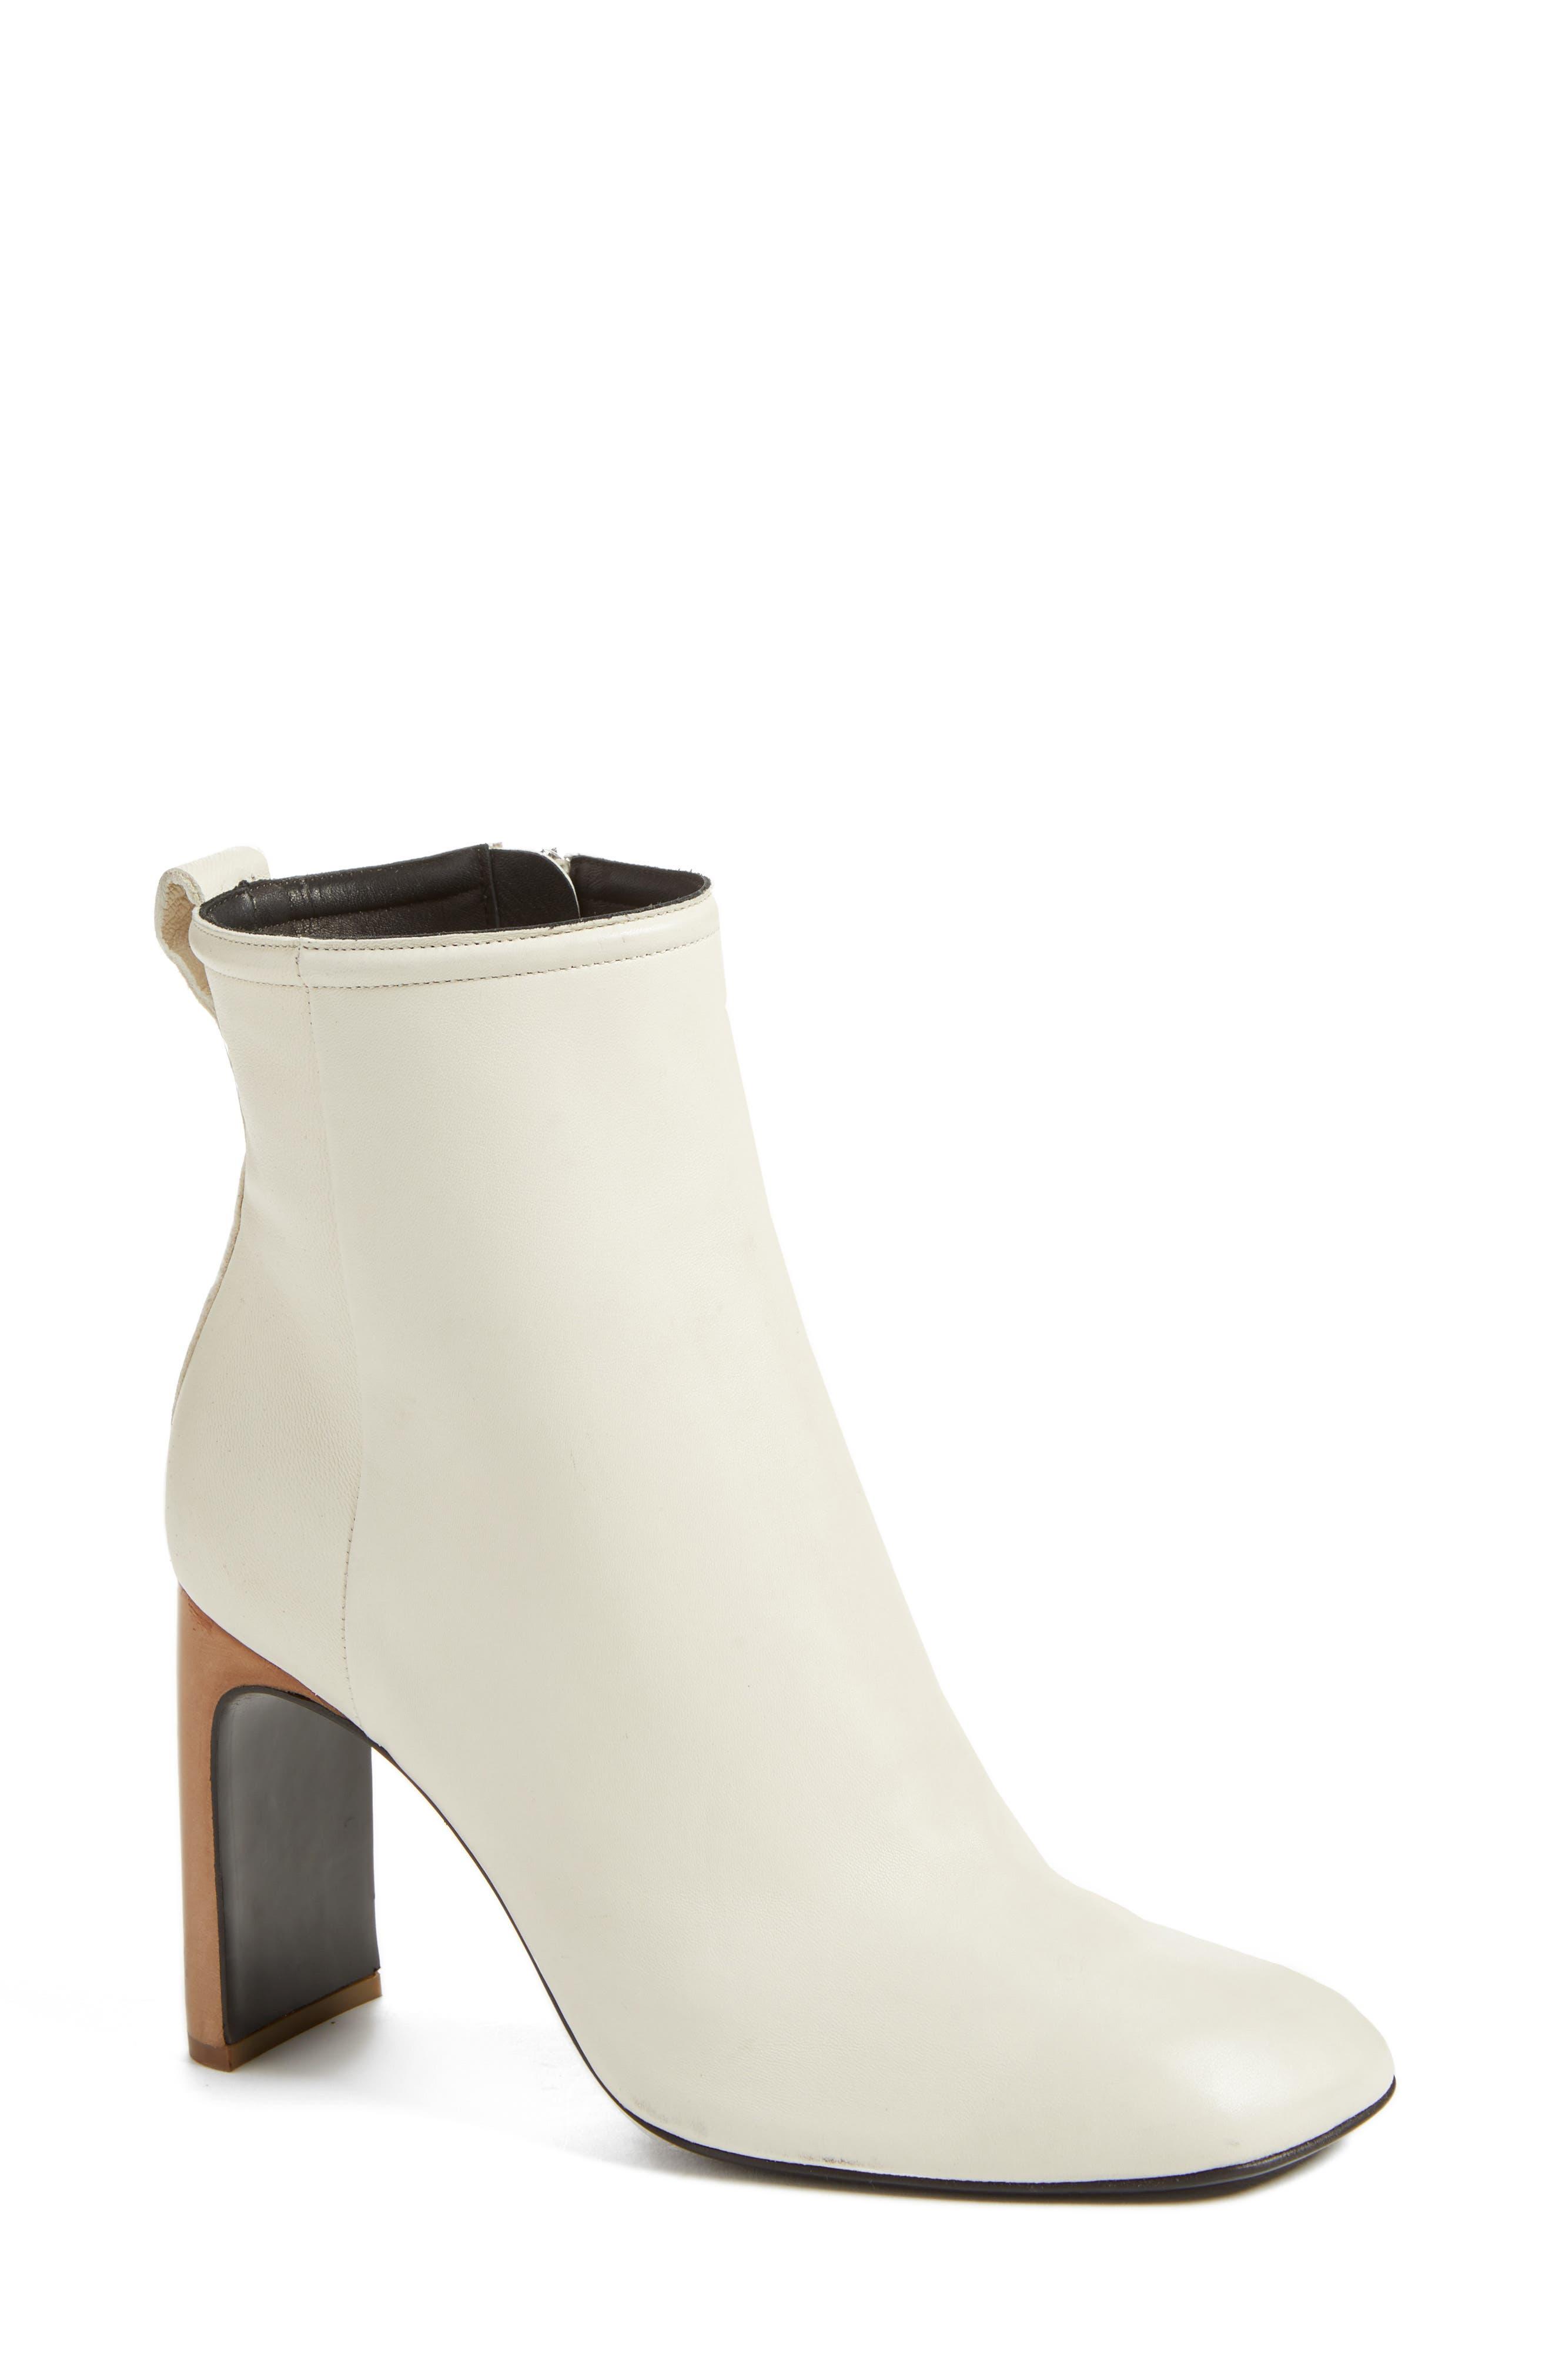 Rag Amp Bone Women S Boots